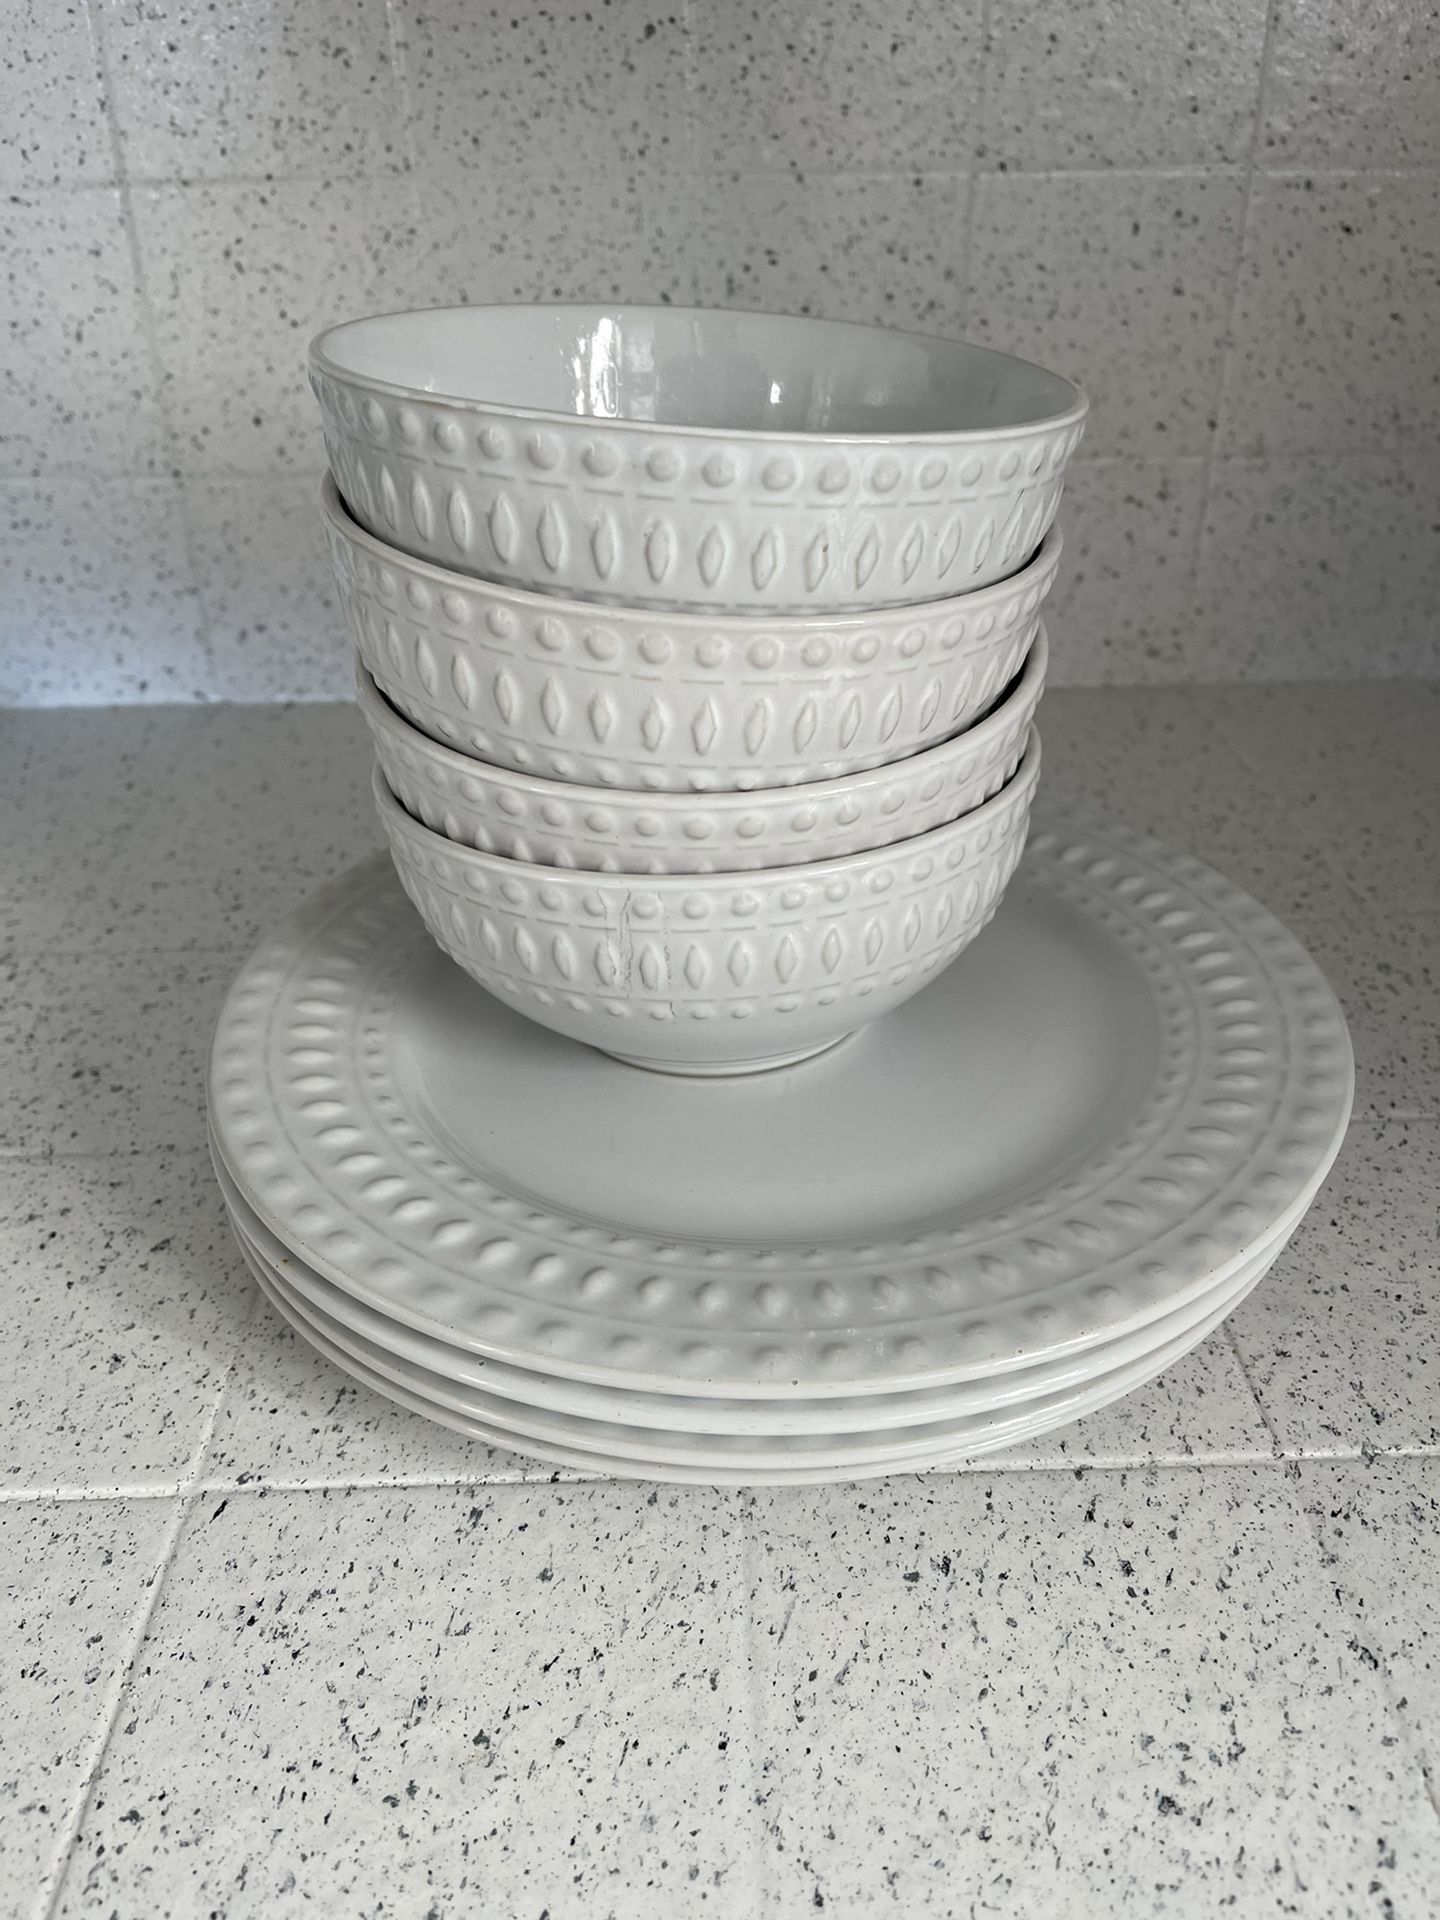 Boho White Plates And Bowls